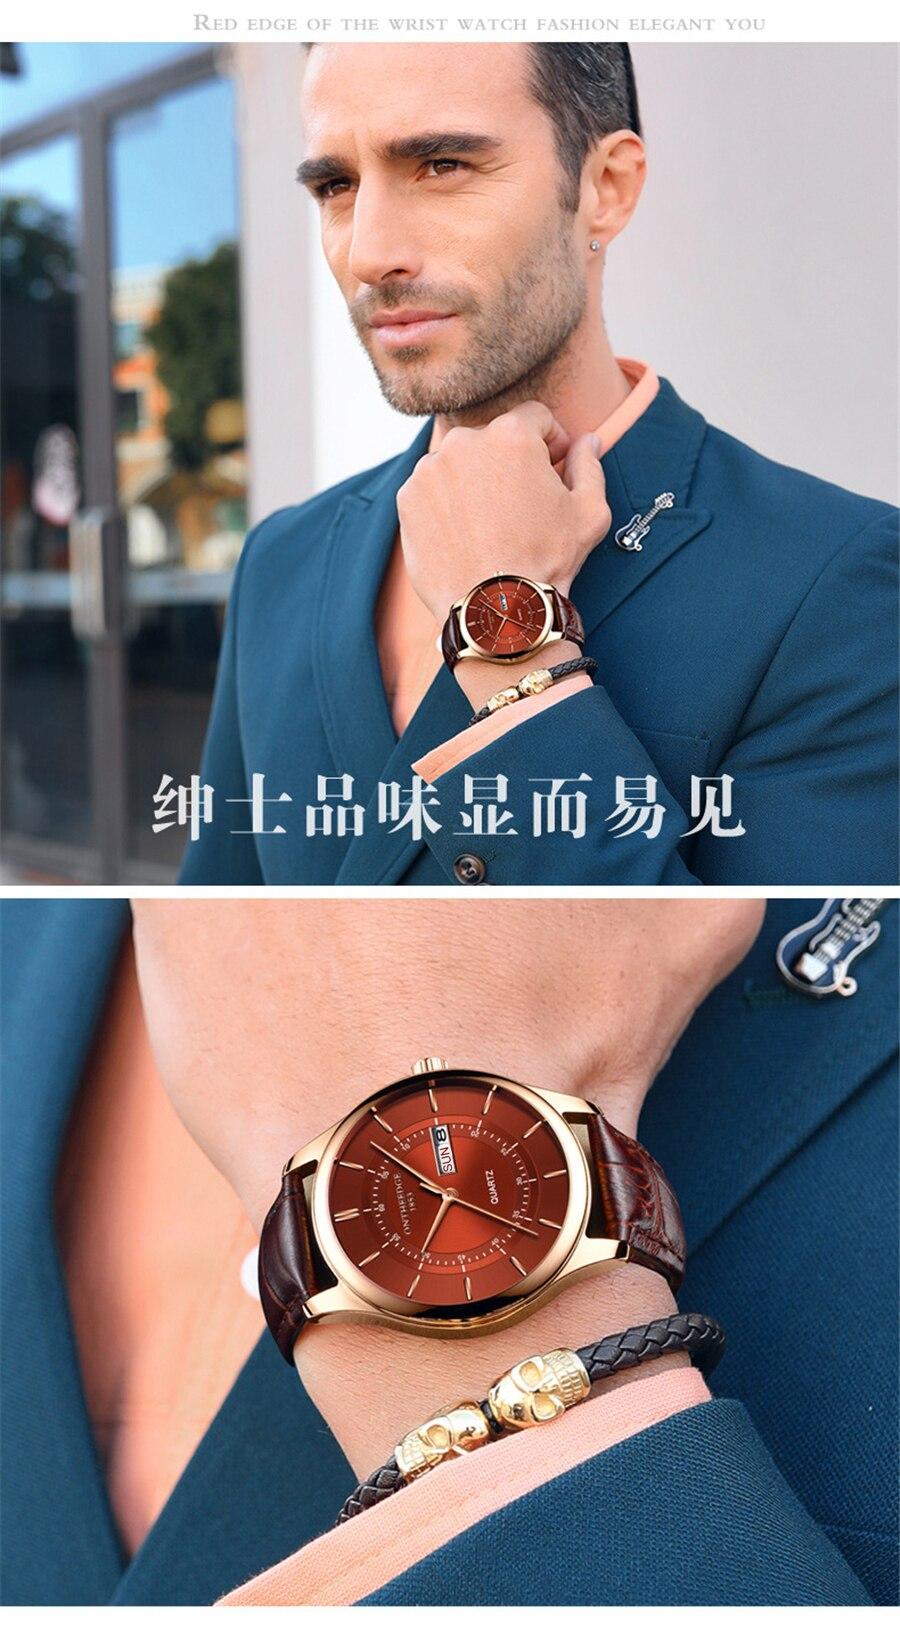 HTB1OCRgi25TBuNjSspcq6znGFXaz High Quality Rose Gold Dial Watch Men Leather Waterproof 30M Watches Business Fashion Japan Quartz Movement Auto Date Male Clock